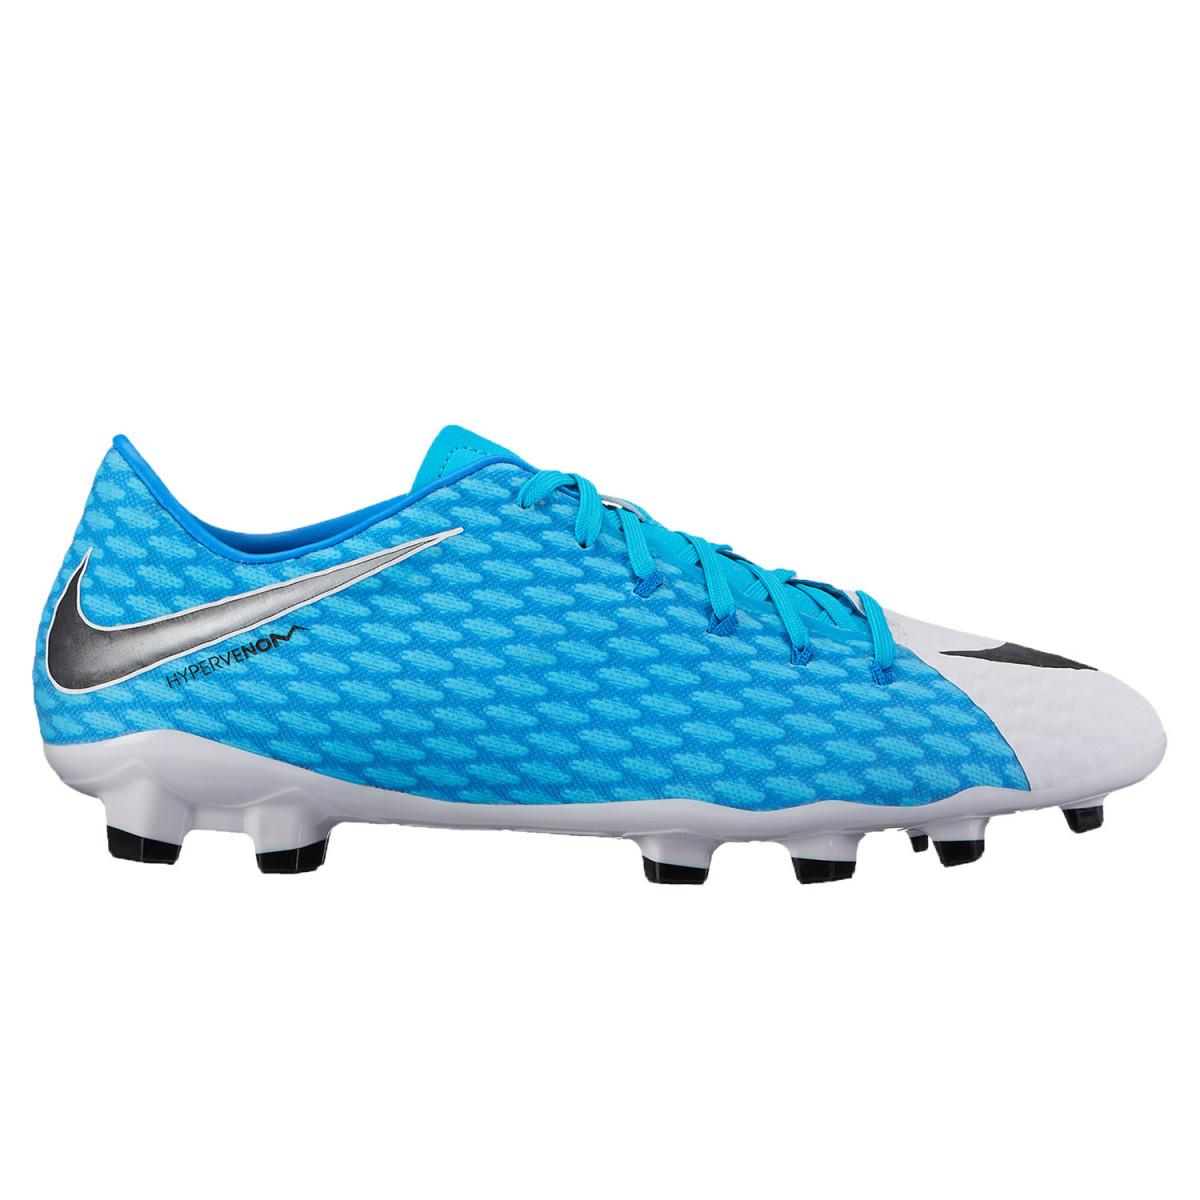 40945a229667f Botines Nike Hypervenom Phade III Tg - Césped - Botines - Hombre